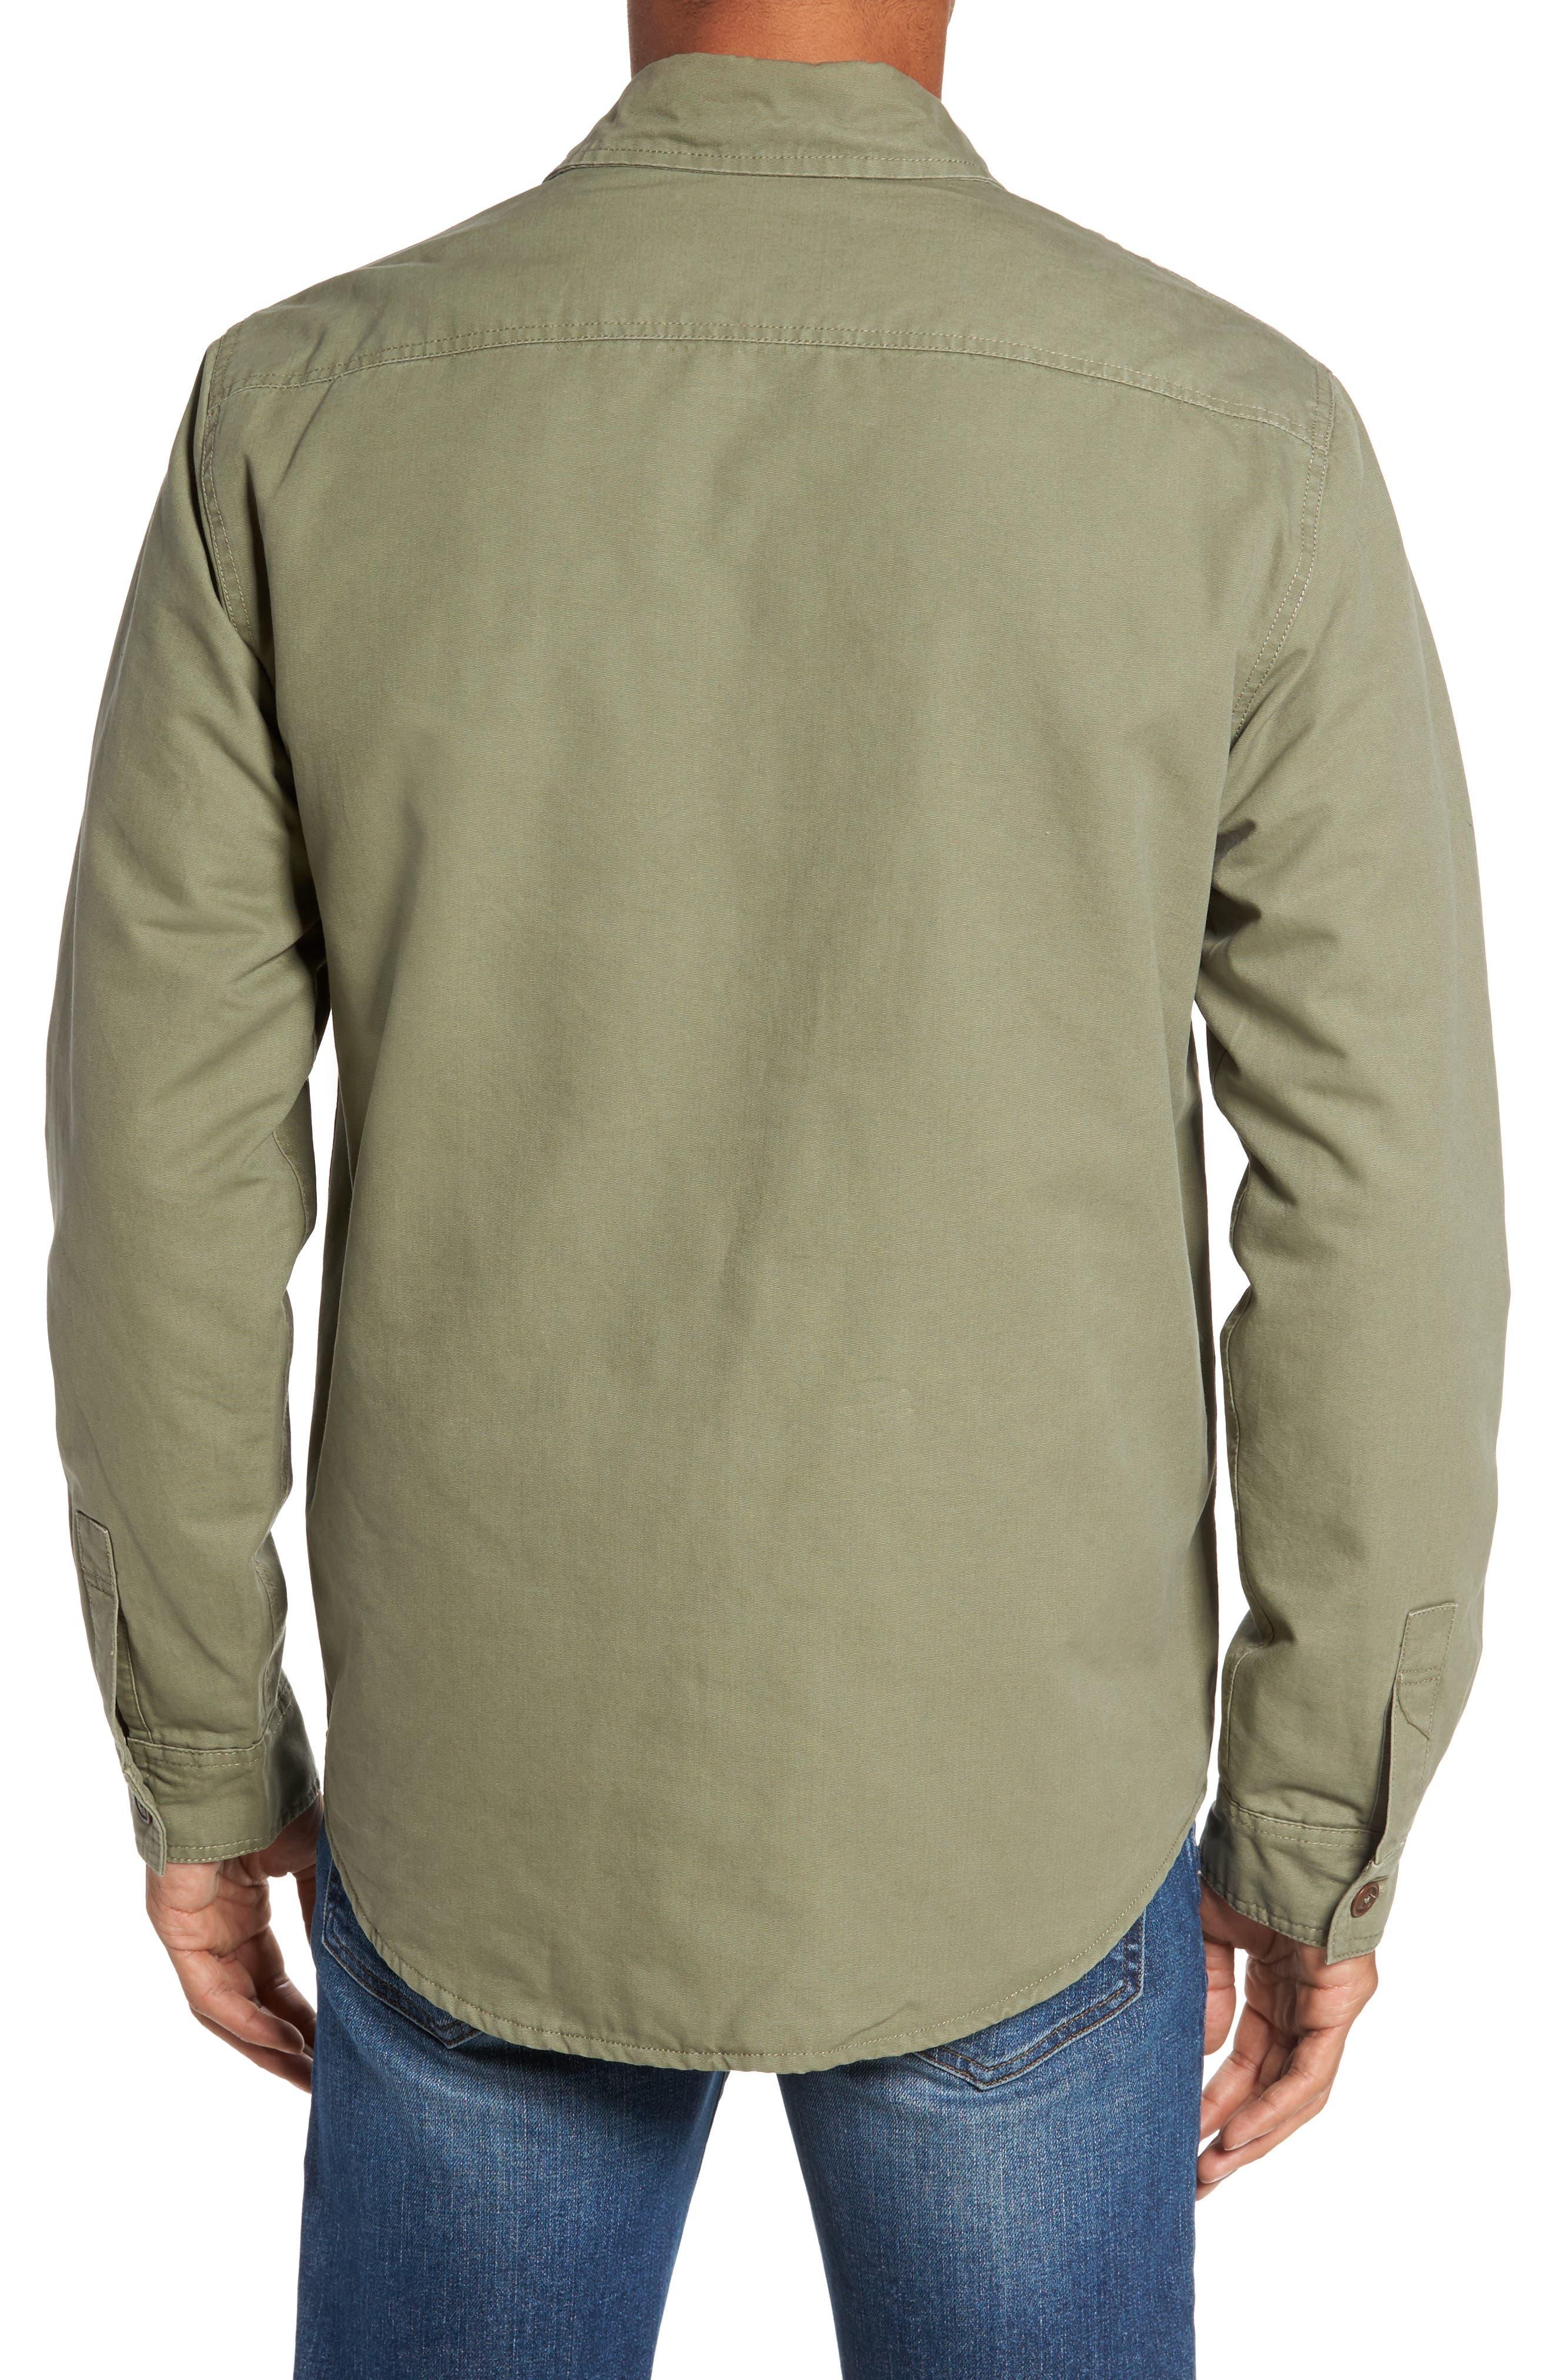 Blanket Lined Shirt Jacket,                             Alternate thumbnail 2, color,                             344